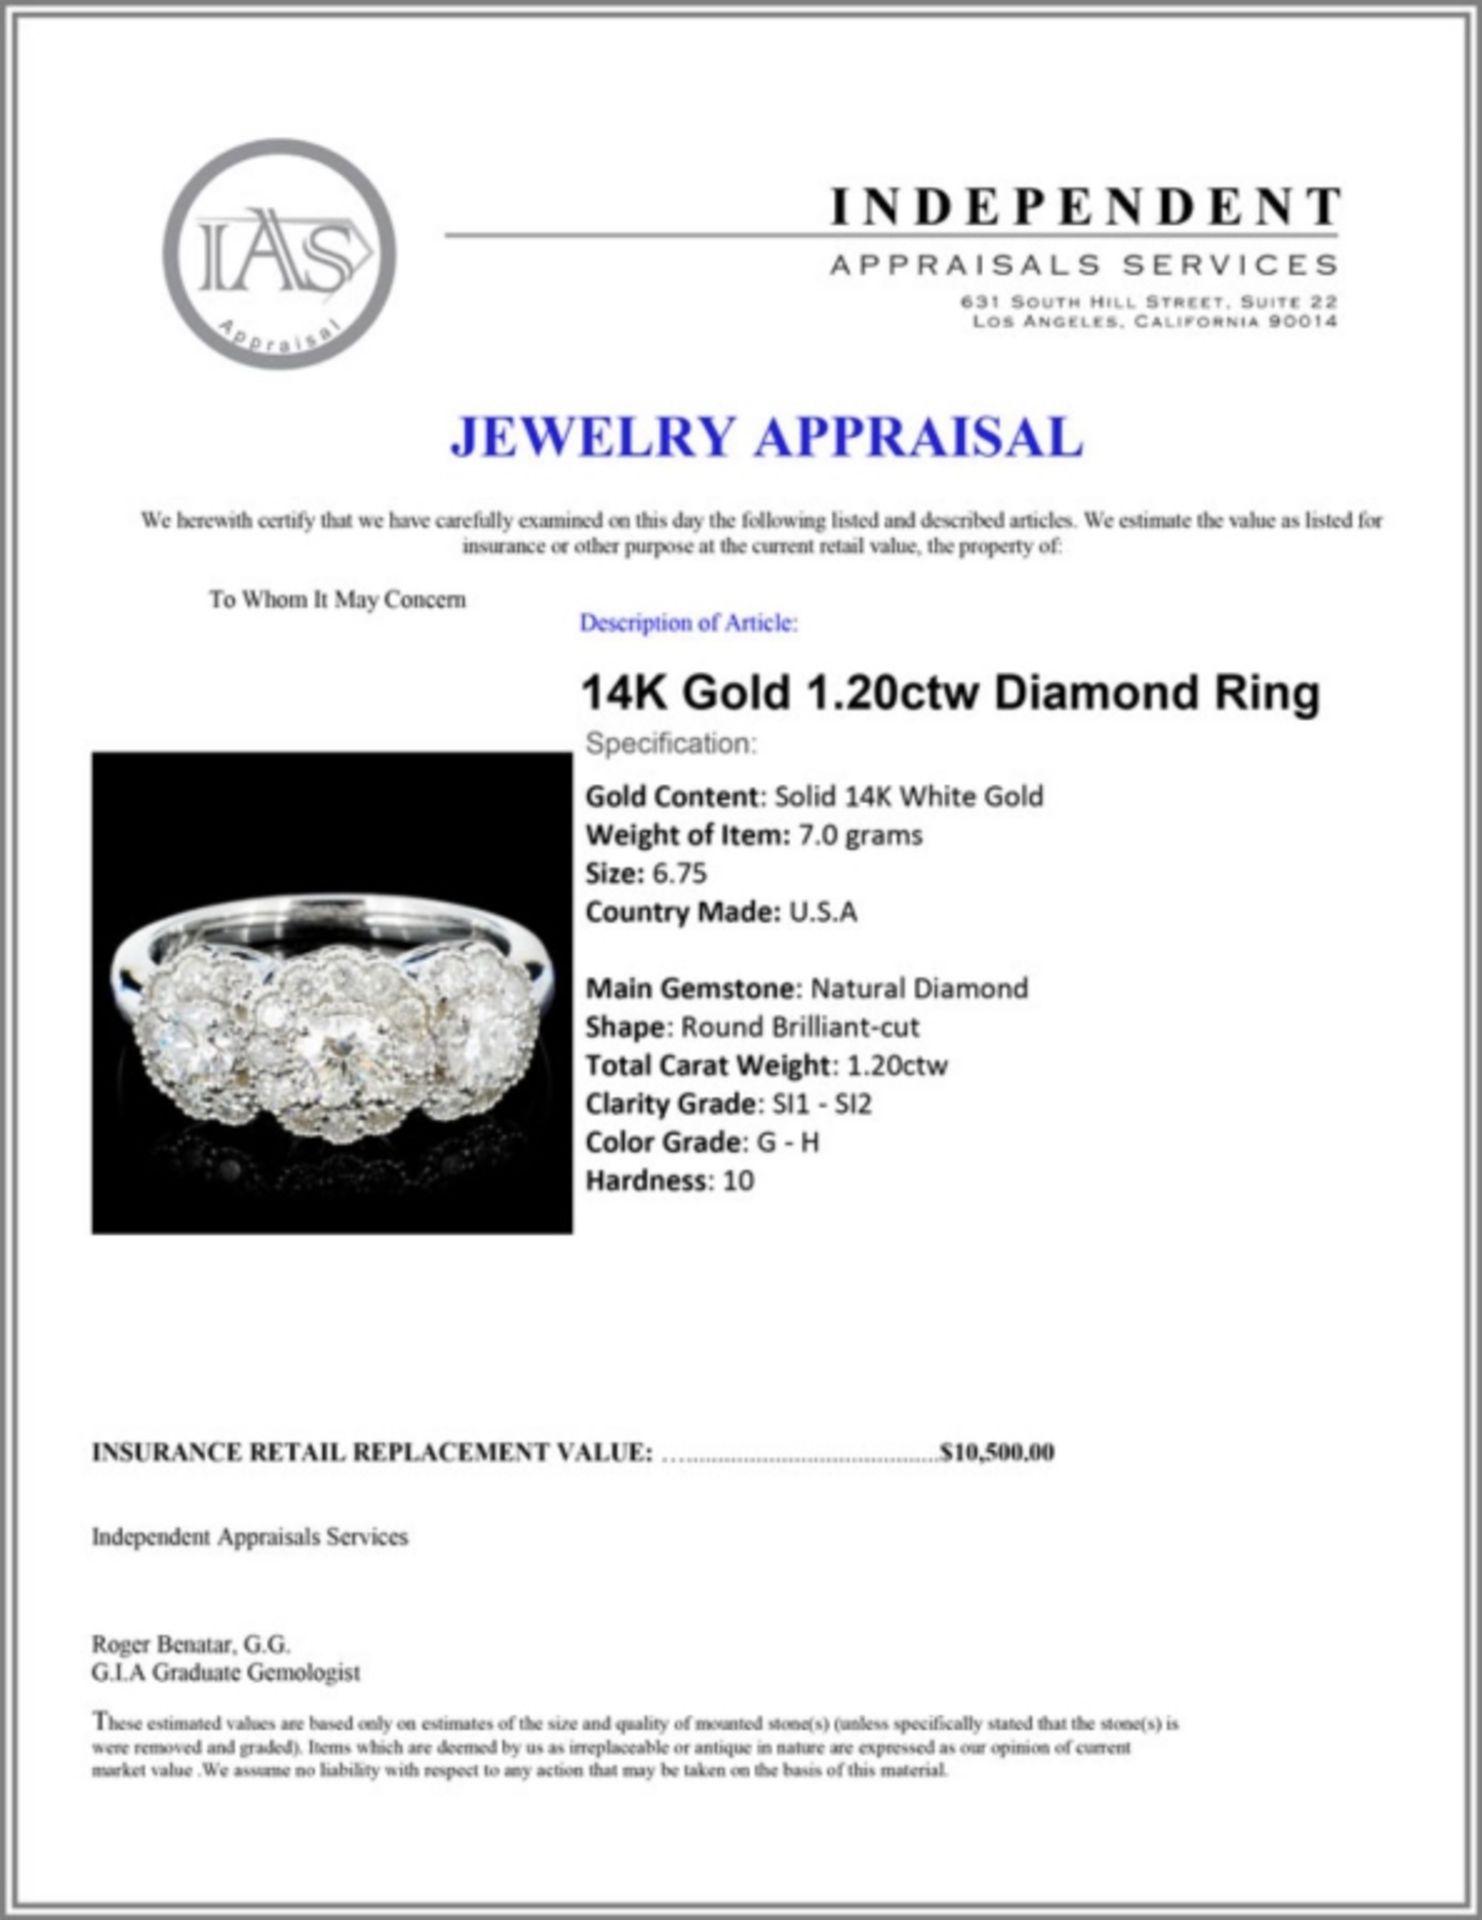 14K Gold 1.20ctw Diamond Ring - Image 4 of 4